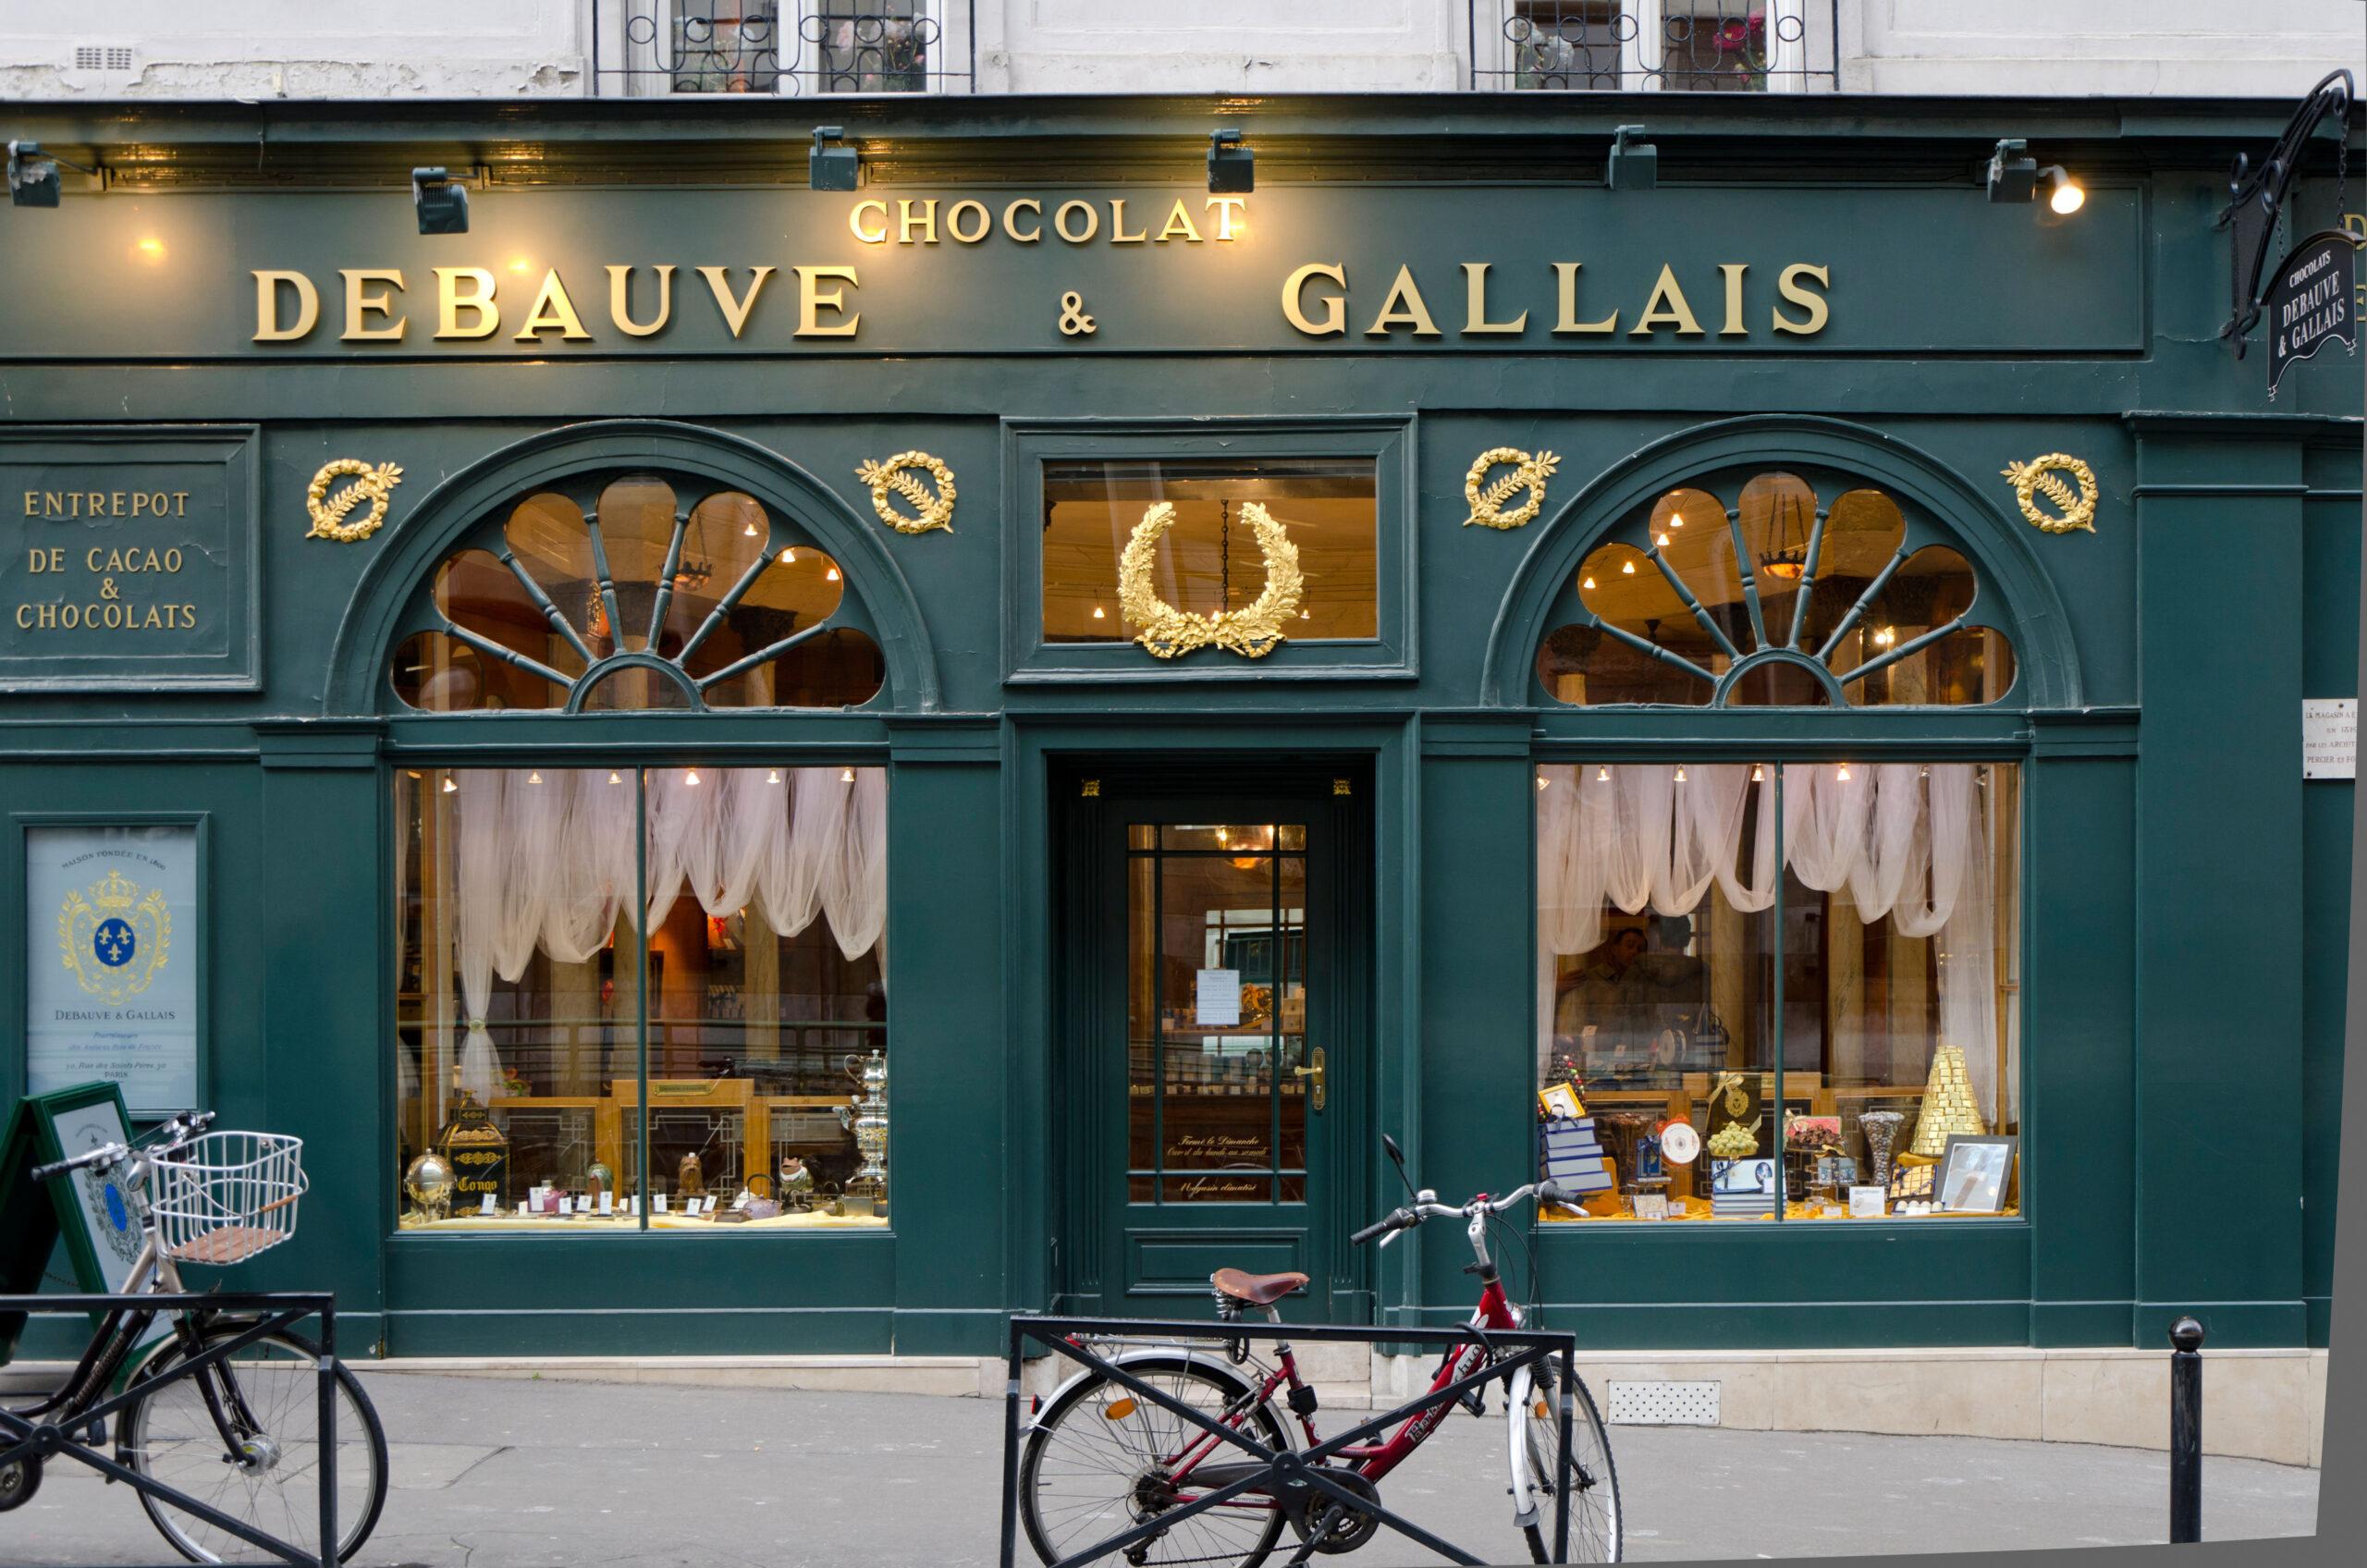 Debauve and Gallais chocolatiers